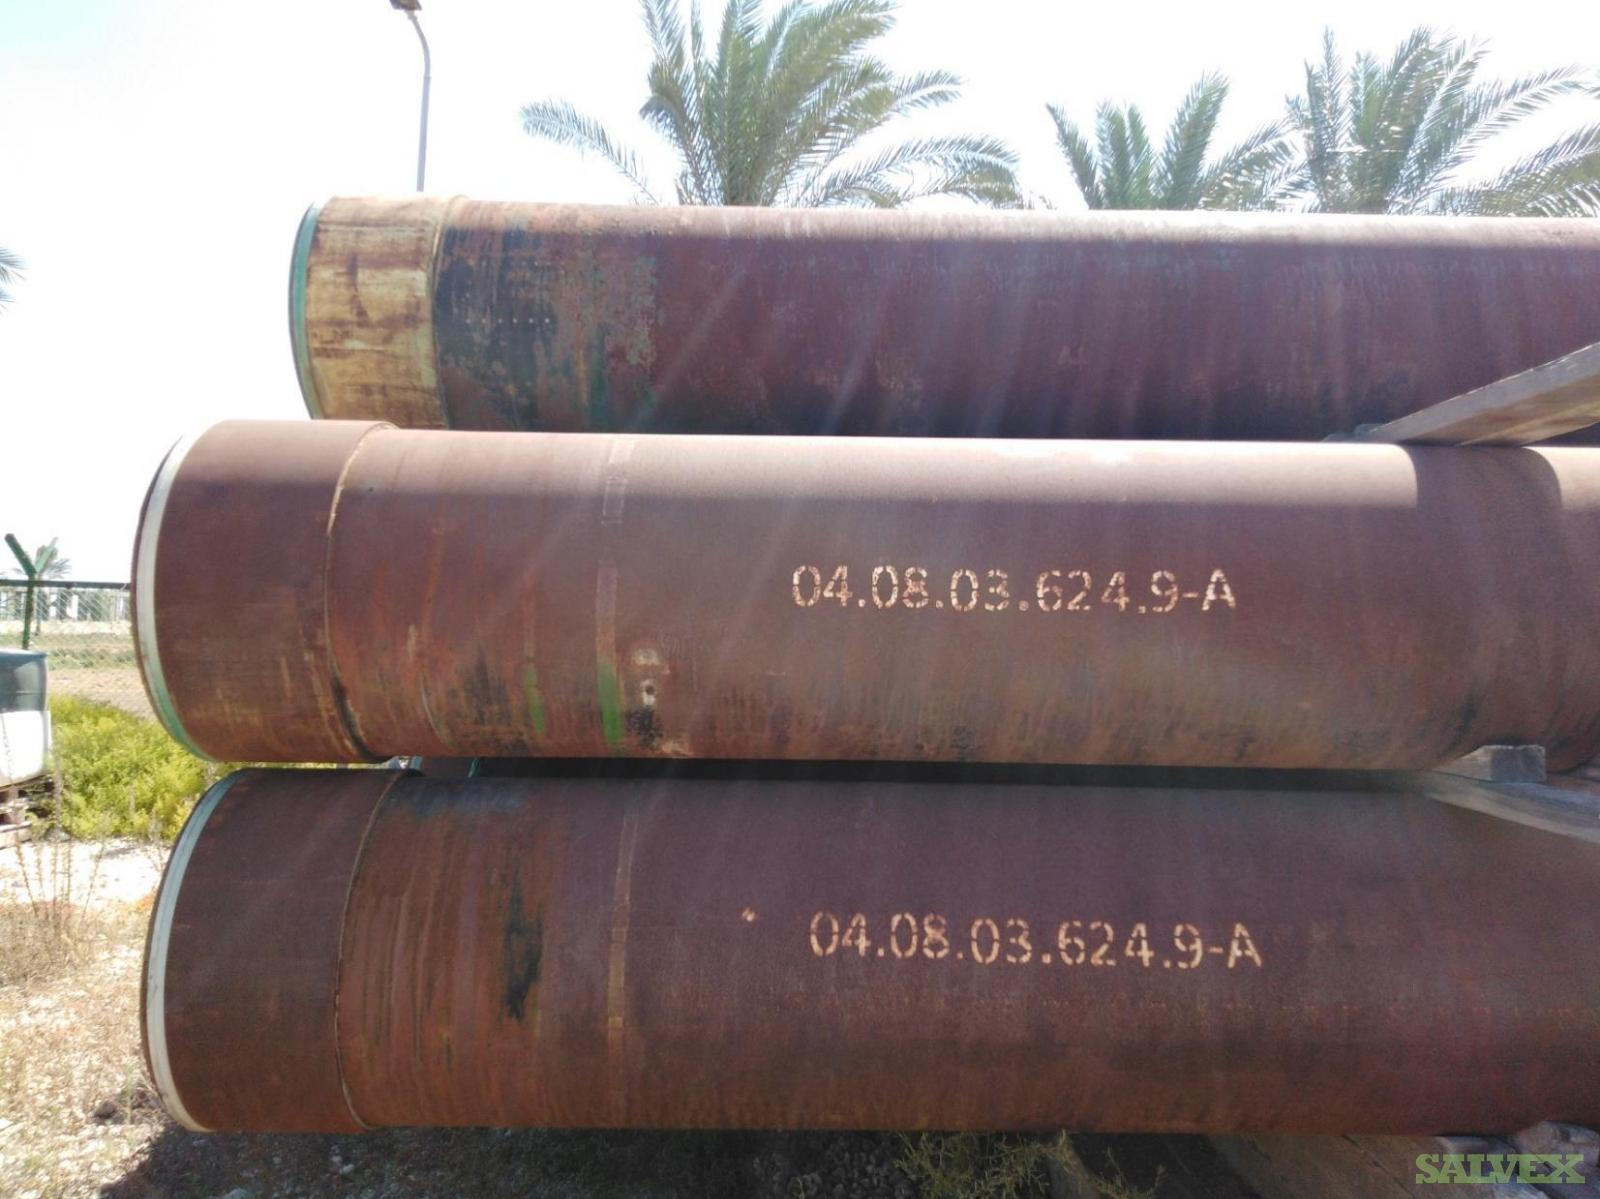 24 1/2 133# K55 BTC R3 Surplus Casing (2,800 Feet / 169 Metric Tons)